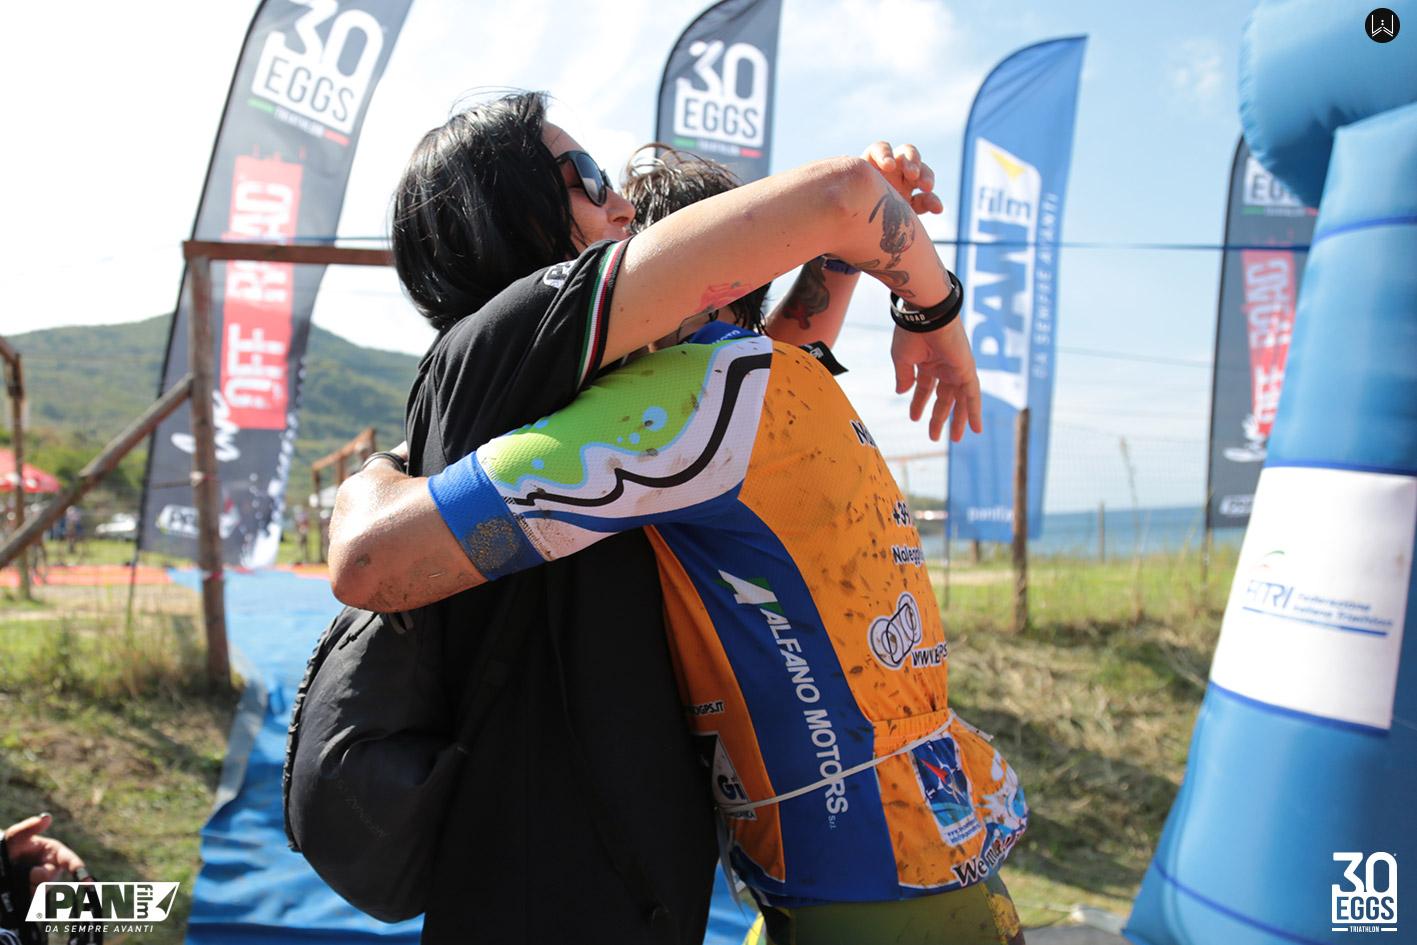 Abbraccio - 30EGGS Triathlon Cross Super Sprint